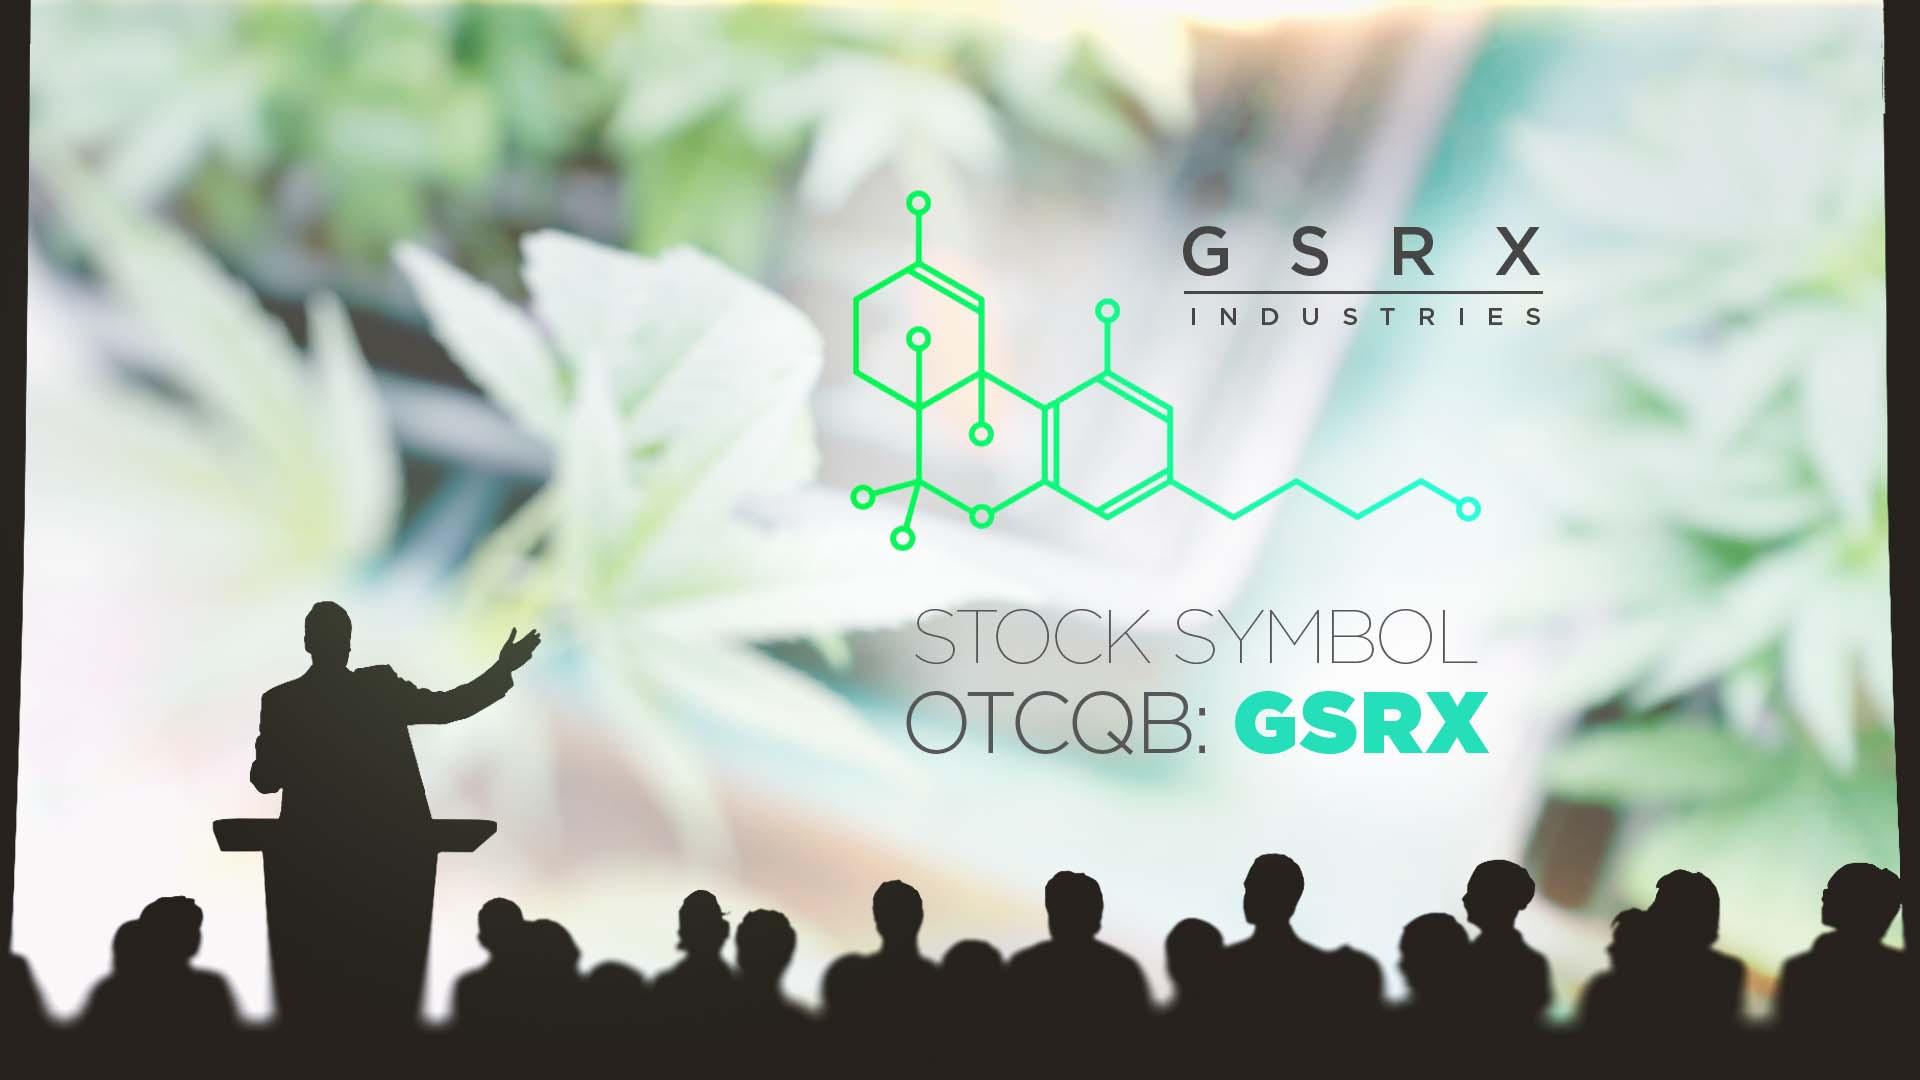 GSRX Industries Webinar image